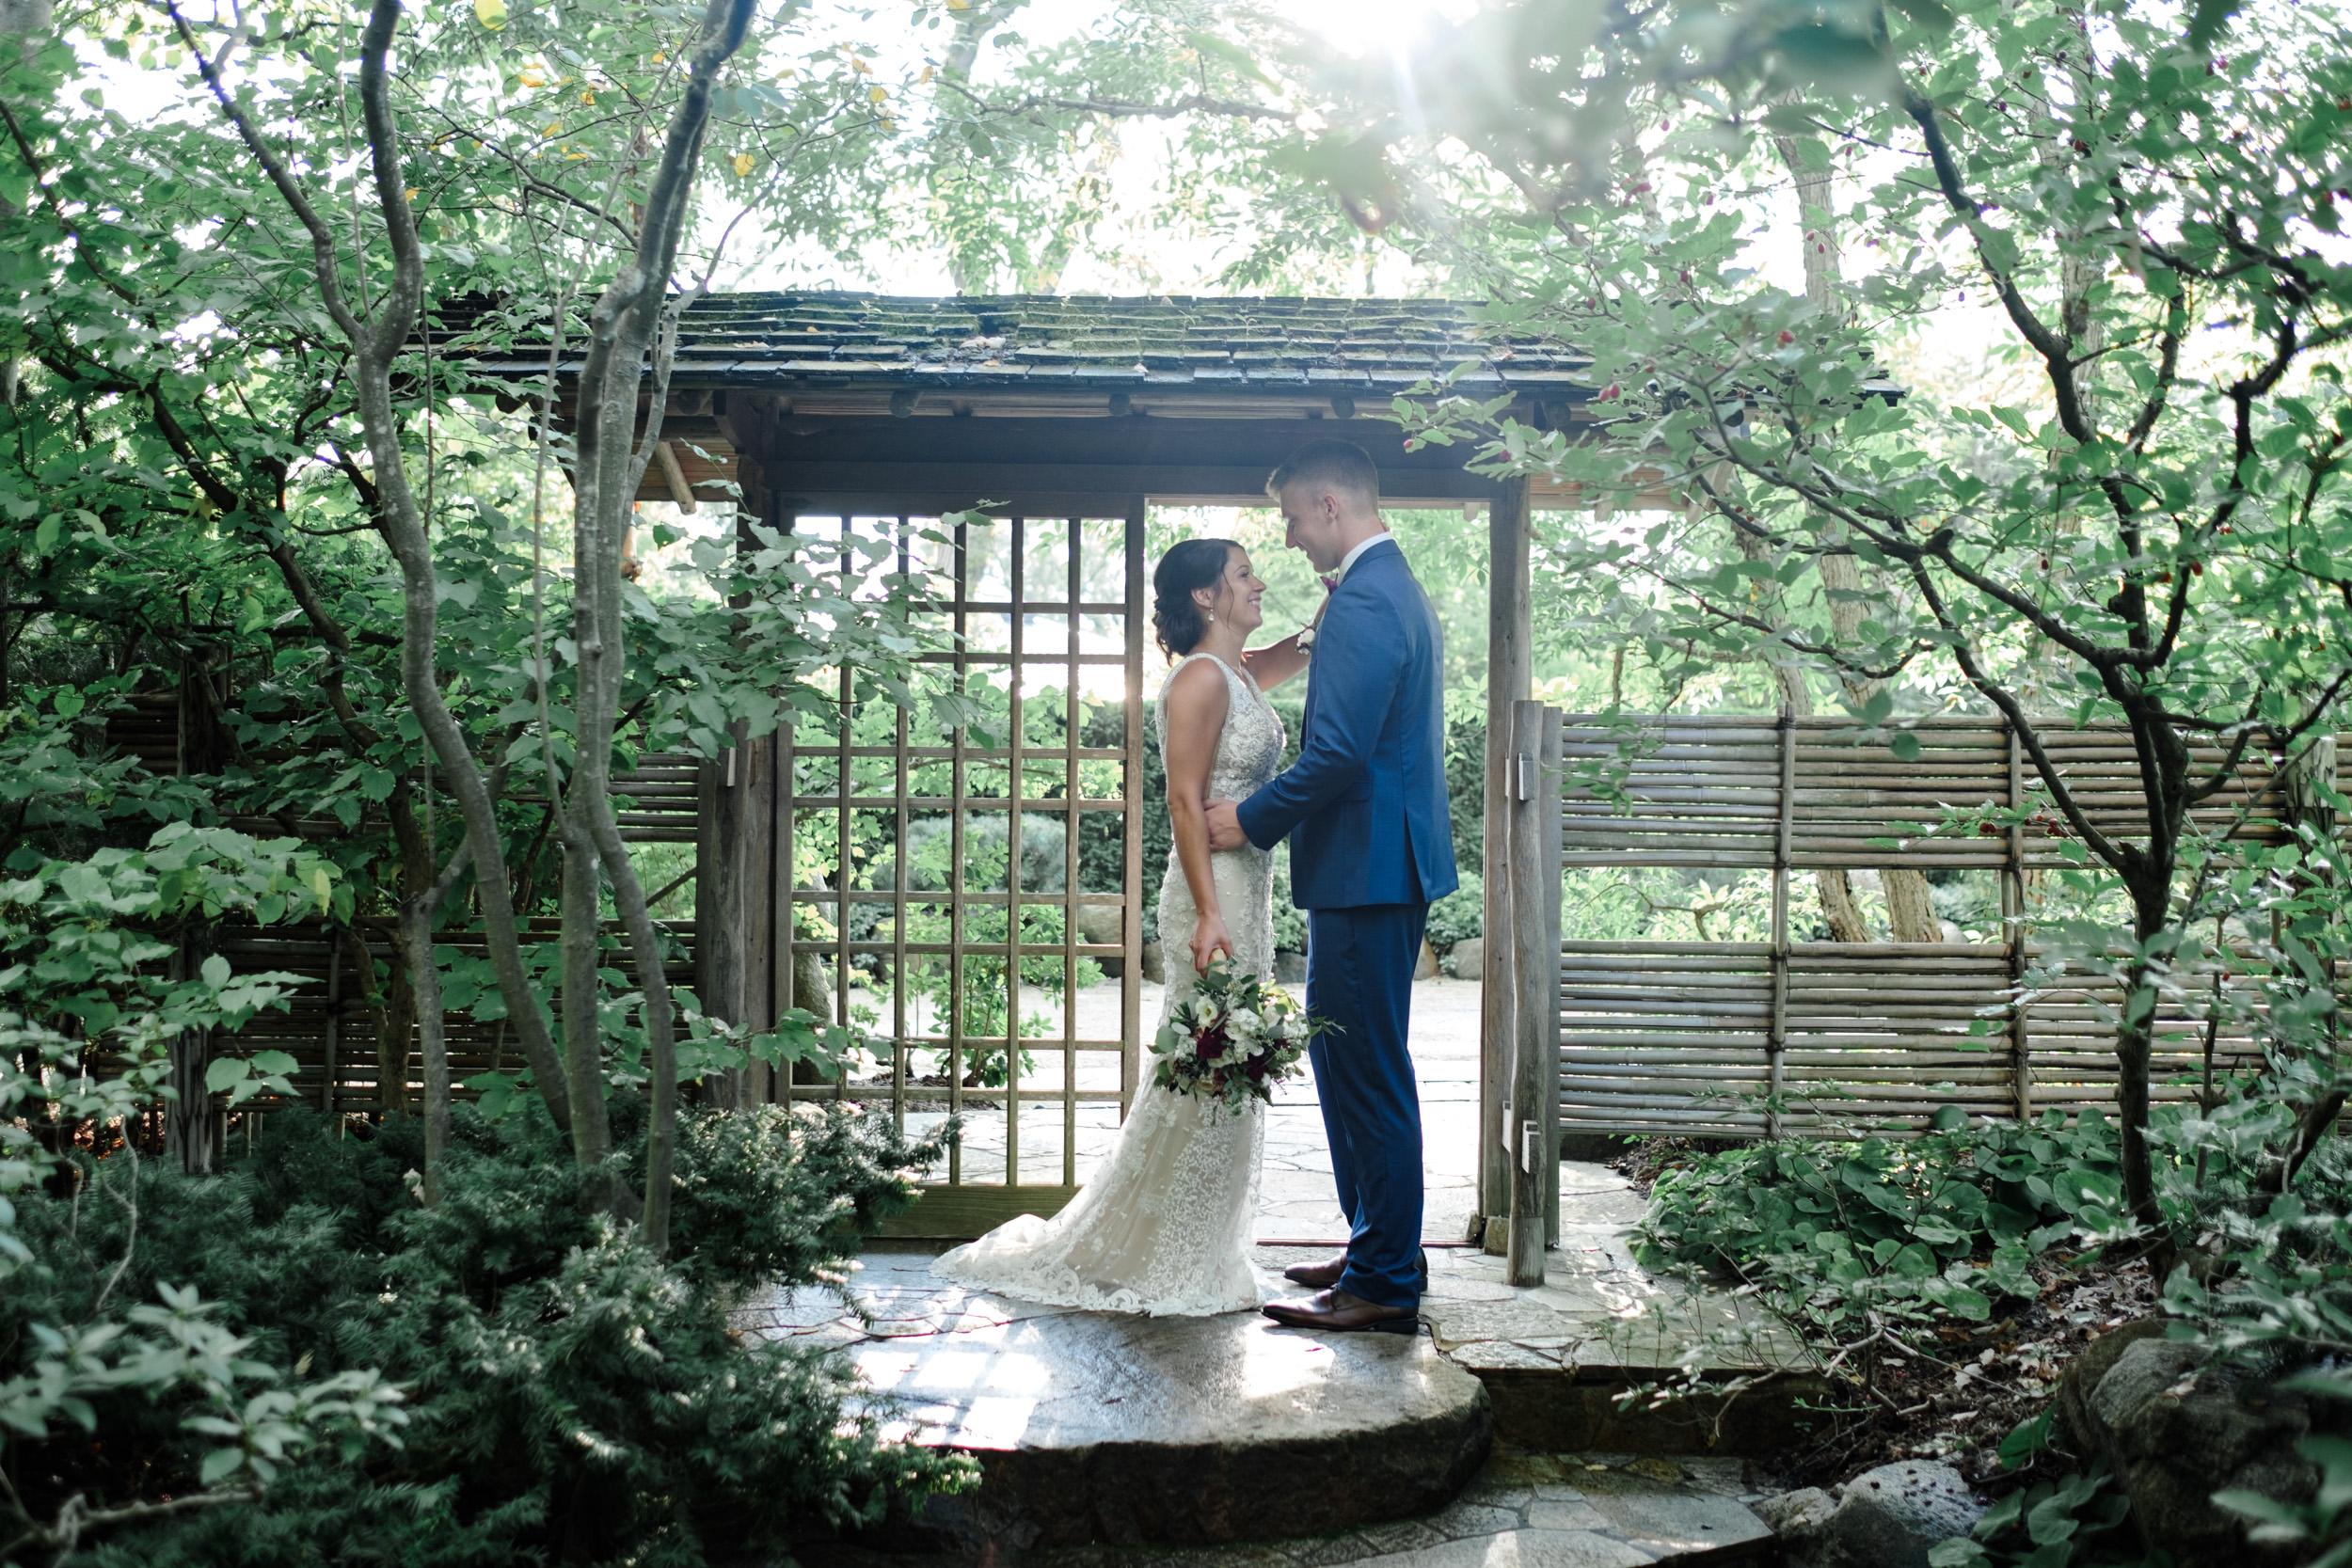 18-09-01 BAP Kiley-Trevor-Anderson-Gardens-Wedding-56.jpg